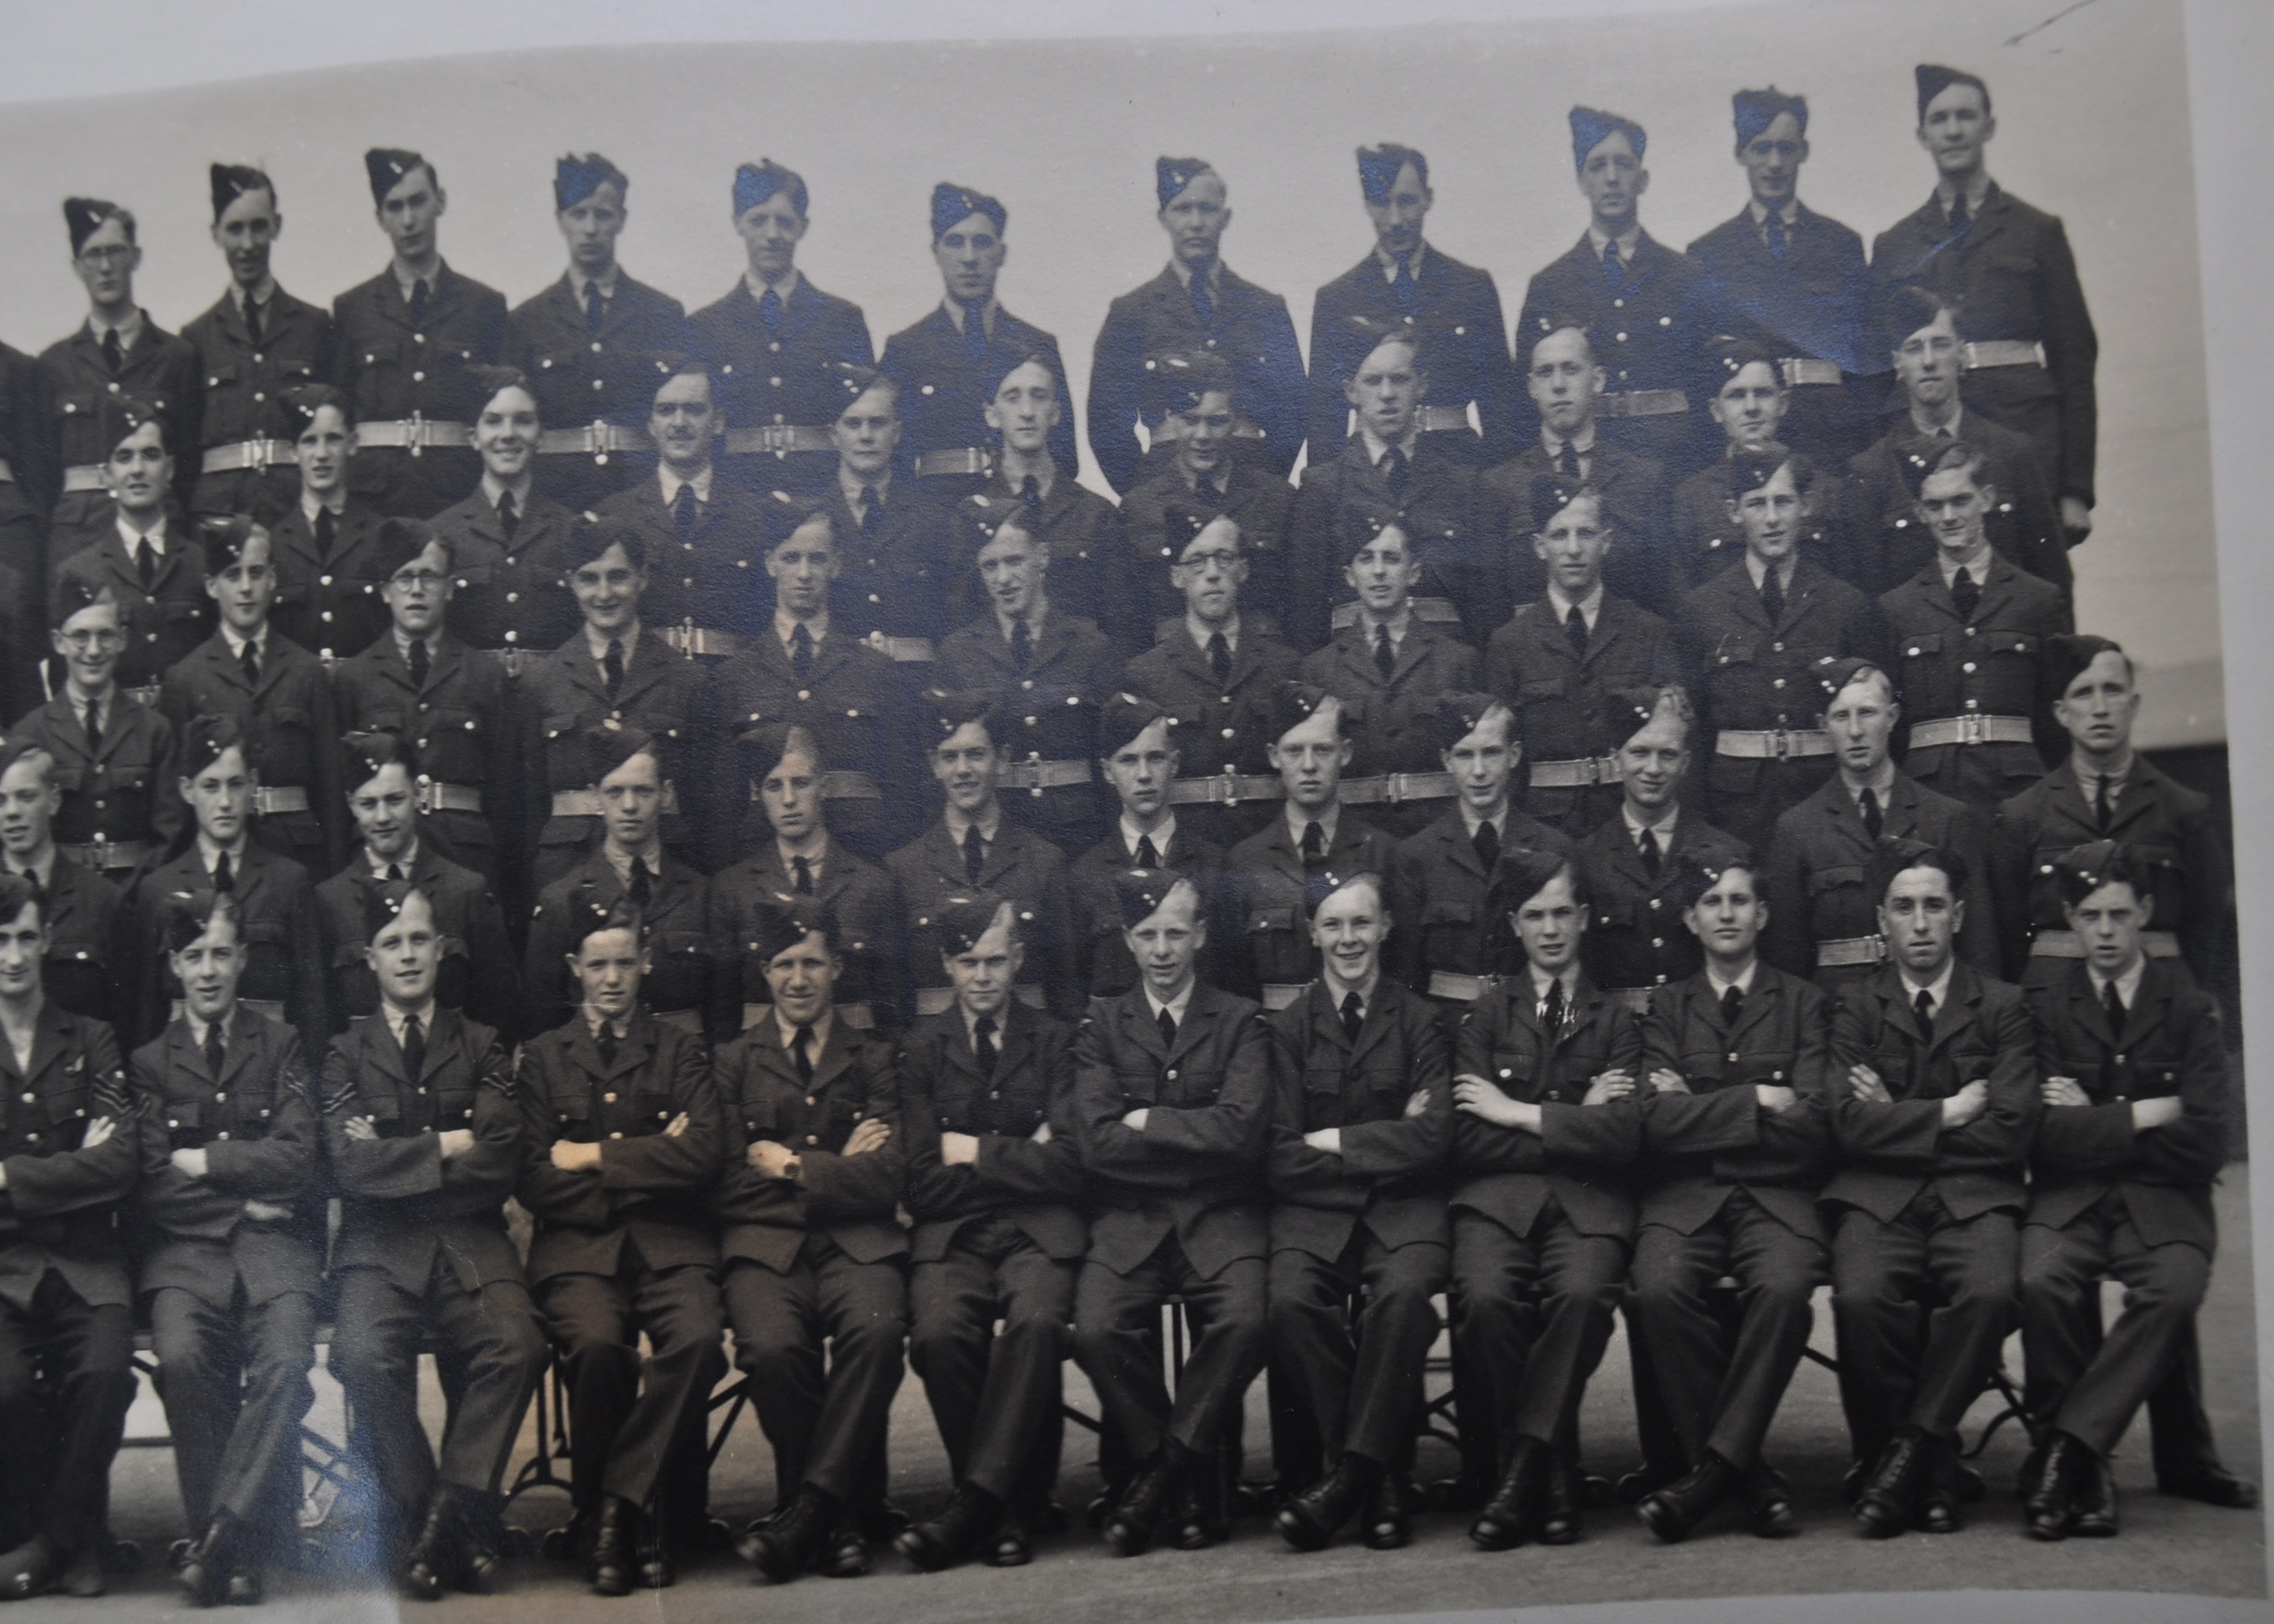 POST-WWII RAF PADGATE - BOB MONKHOUSE - AUTOGRAPHED REGIMENTAL PHOTOGRAPH - Image 3 of 8